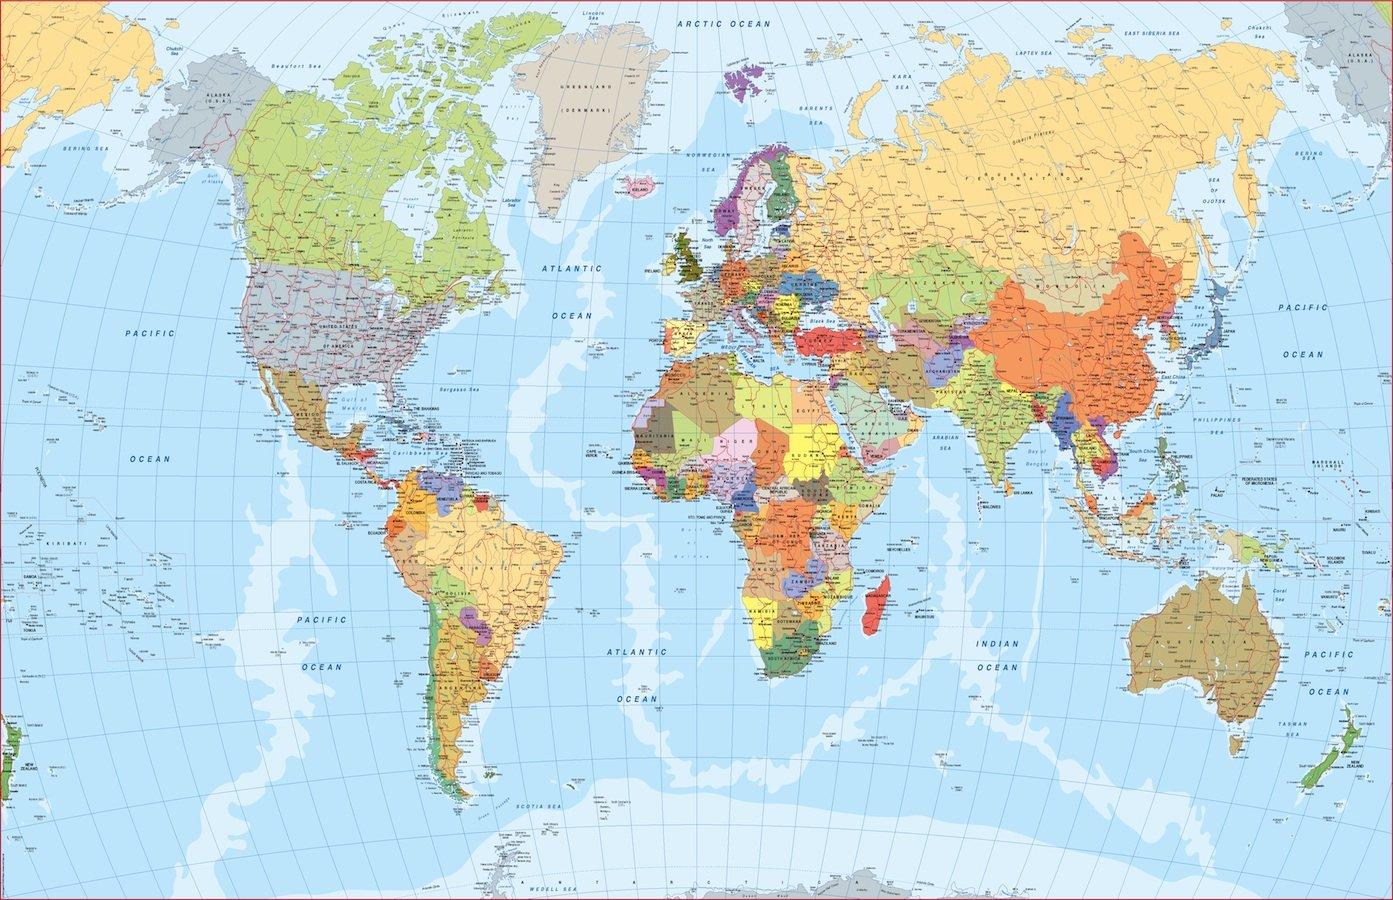 Cartina Mondo Paesi.Mappa Del Mondo Inglese Mappe Mondo Netmaps